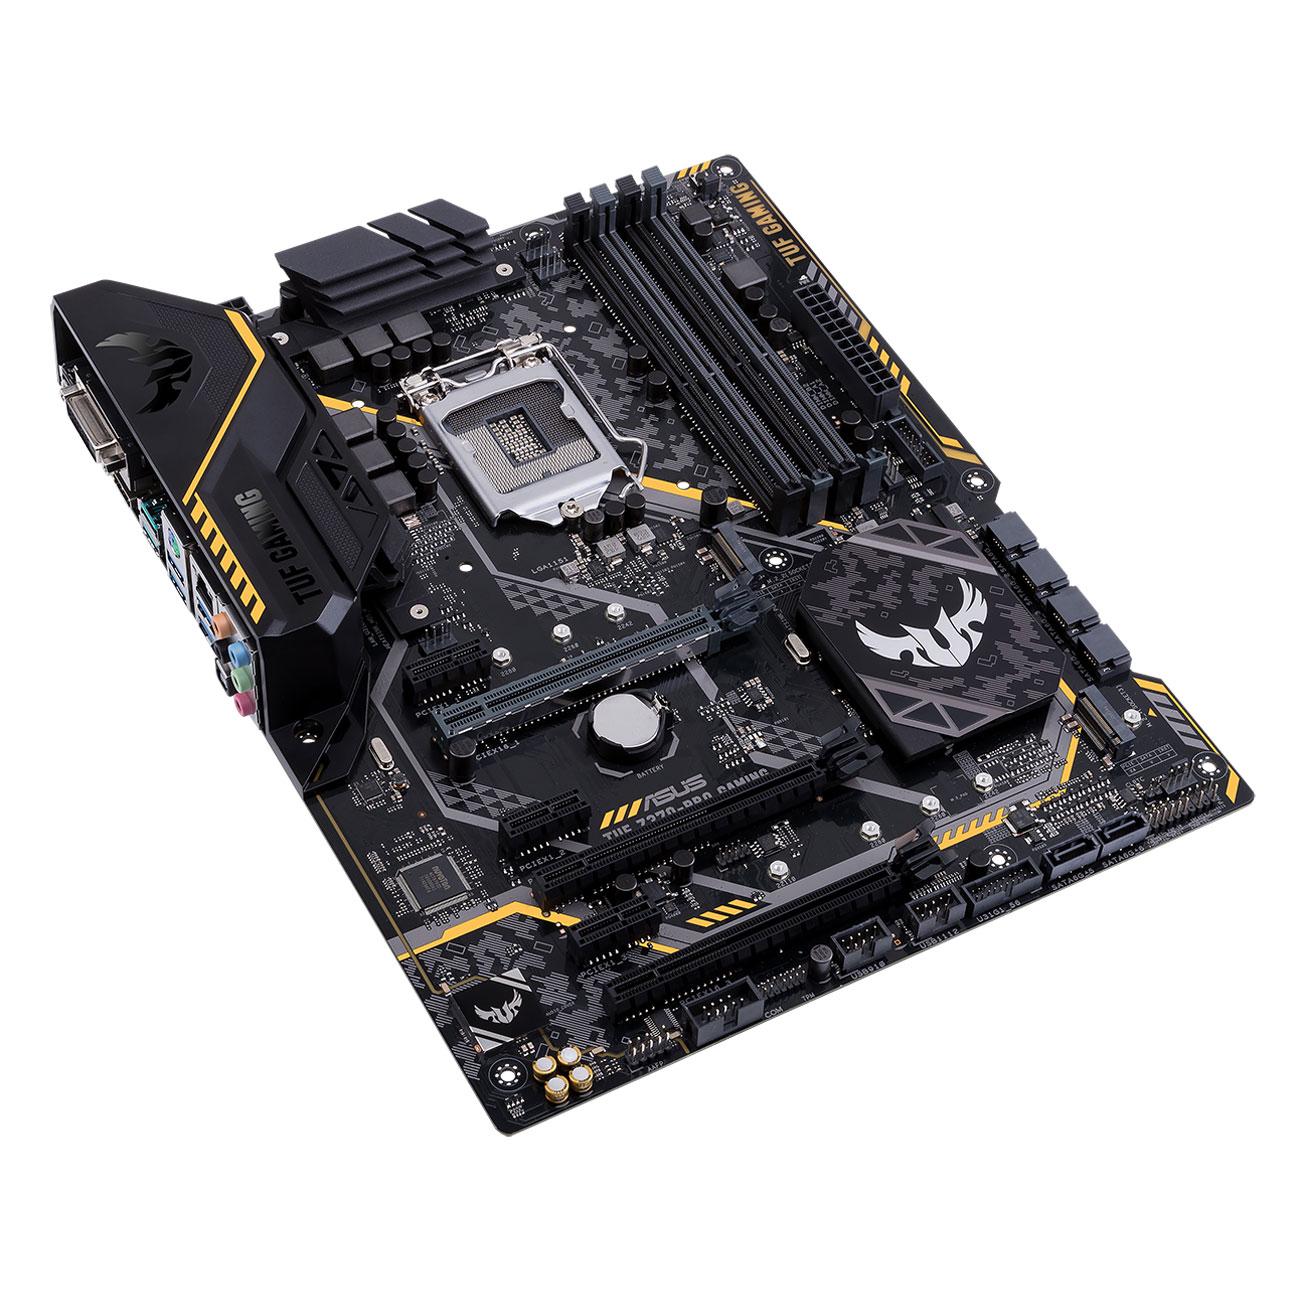 Asus TUF Z370-PRO GAMING ATX DDR4 - Carte mère Asus - Cybertek.fr - 2